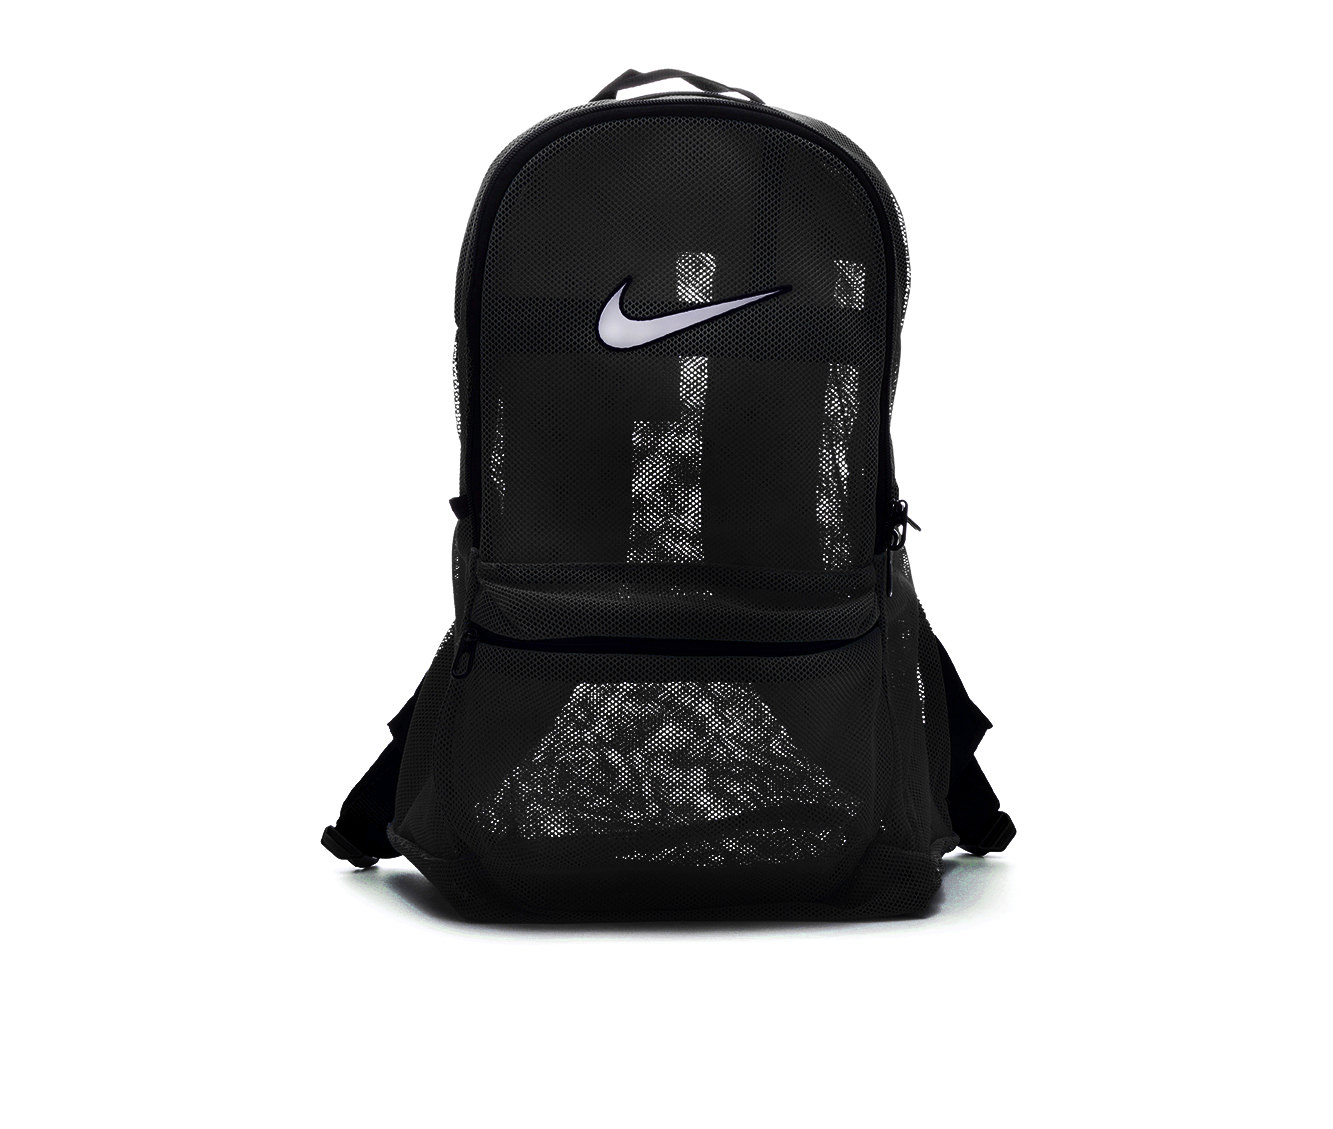 Nike Brasilia Mesh Backpack (Black - Size UNSZ) 1653154